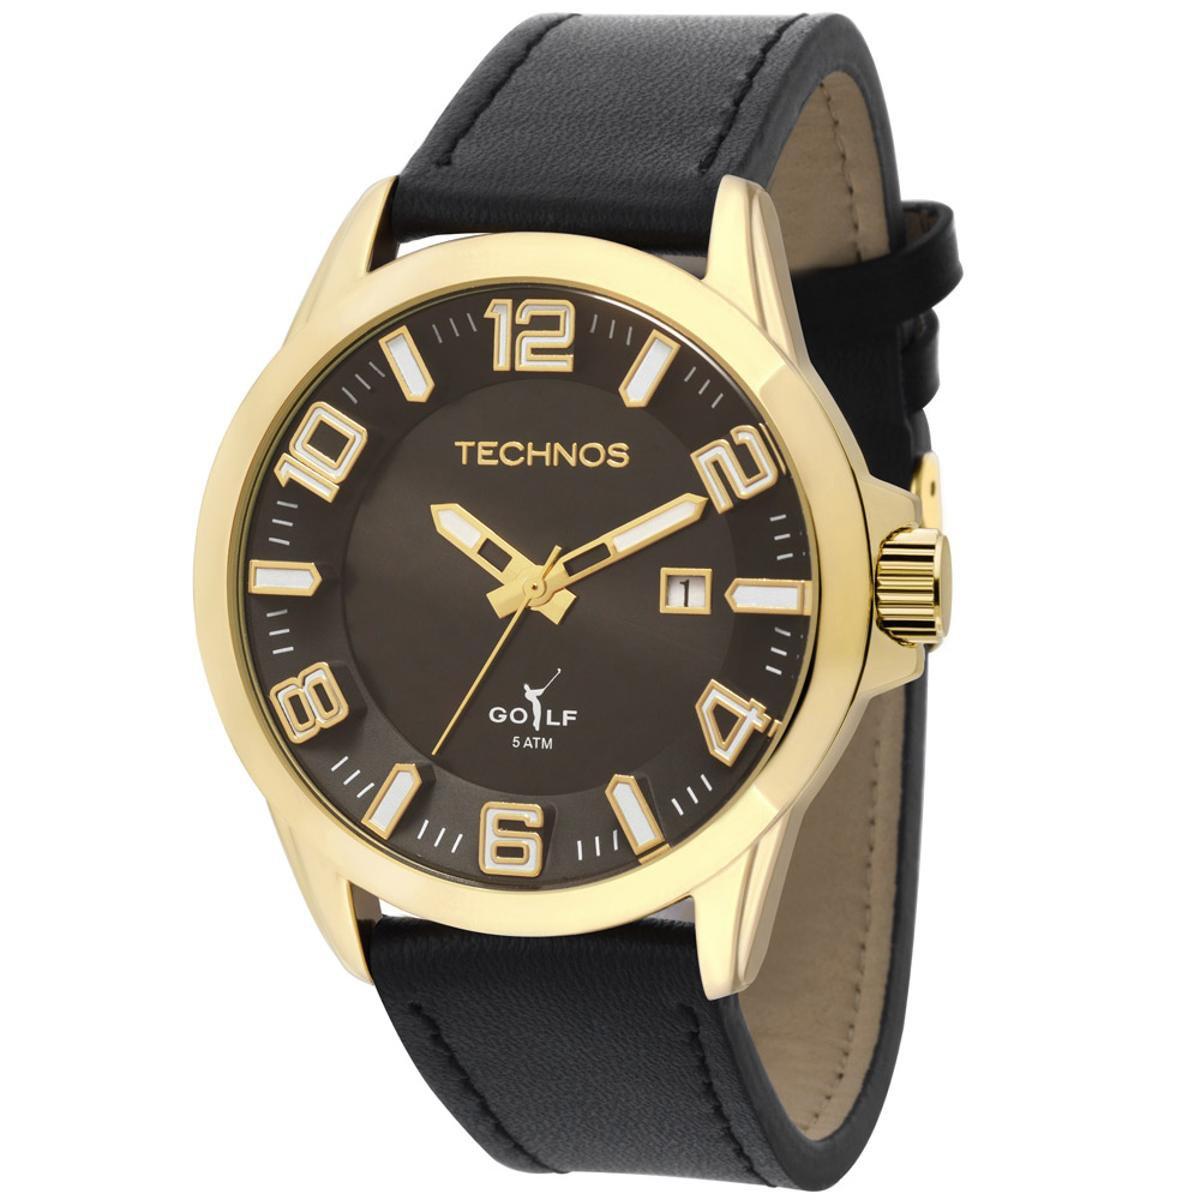 12c77028a8203 Relógio Technos Golf Masculino Analógico - 2115KQT 2P 2115KQT 2P ...